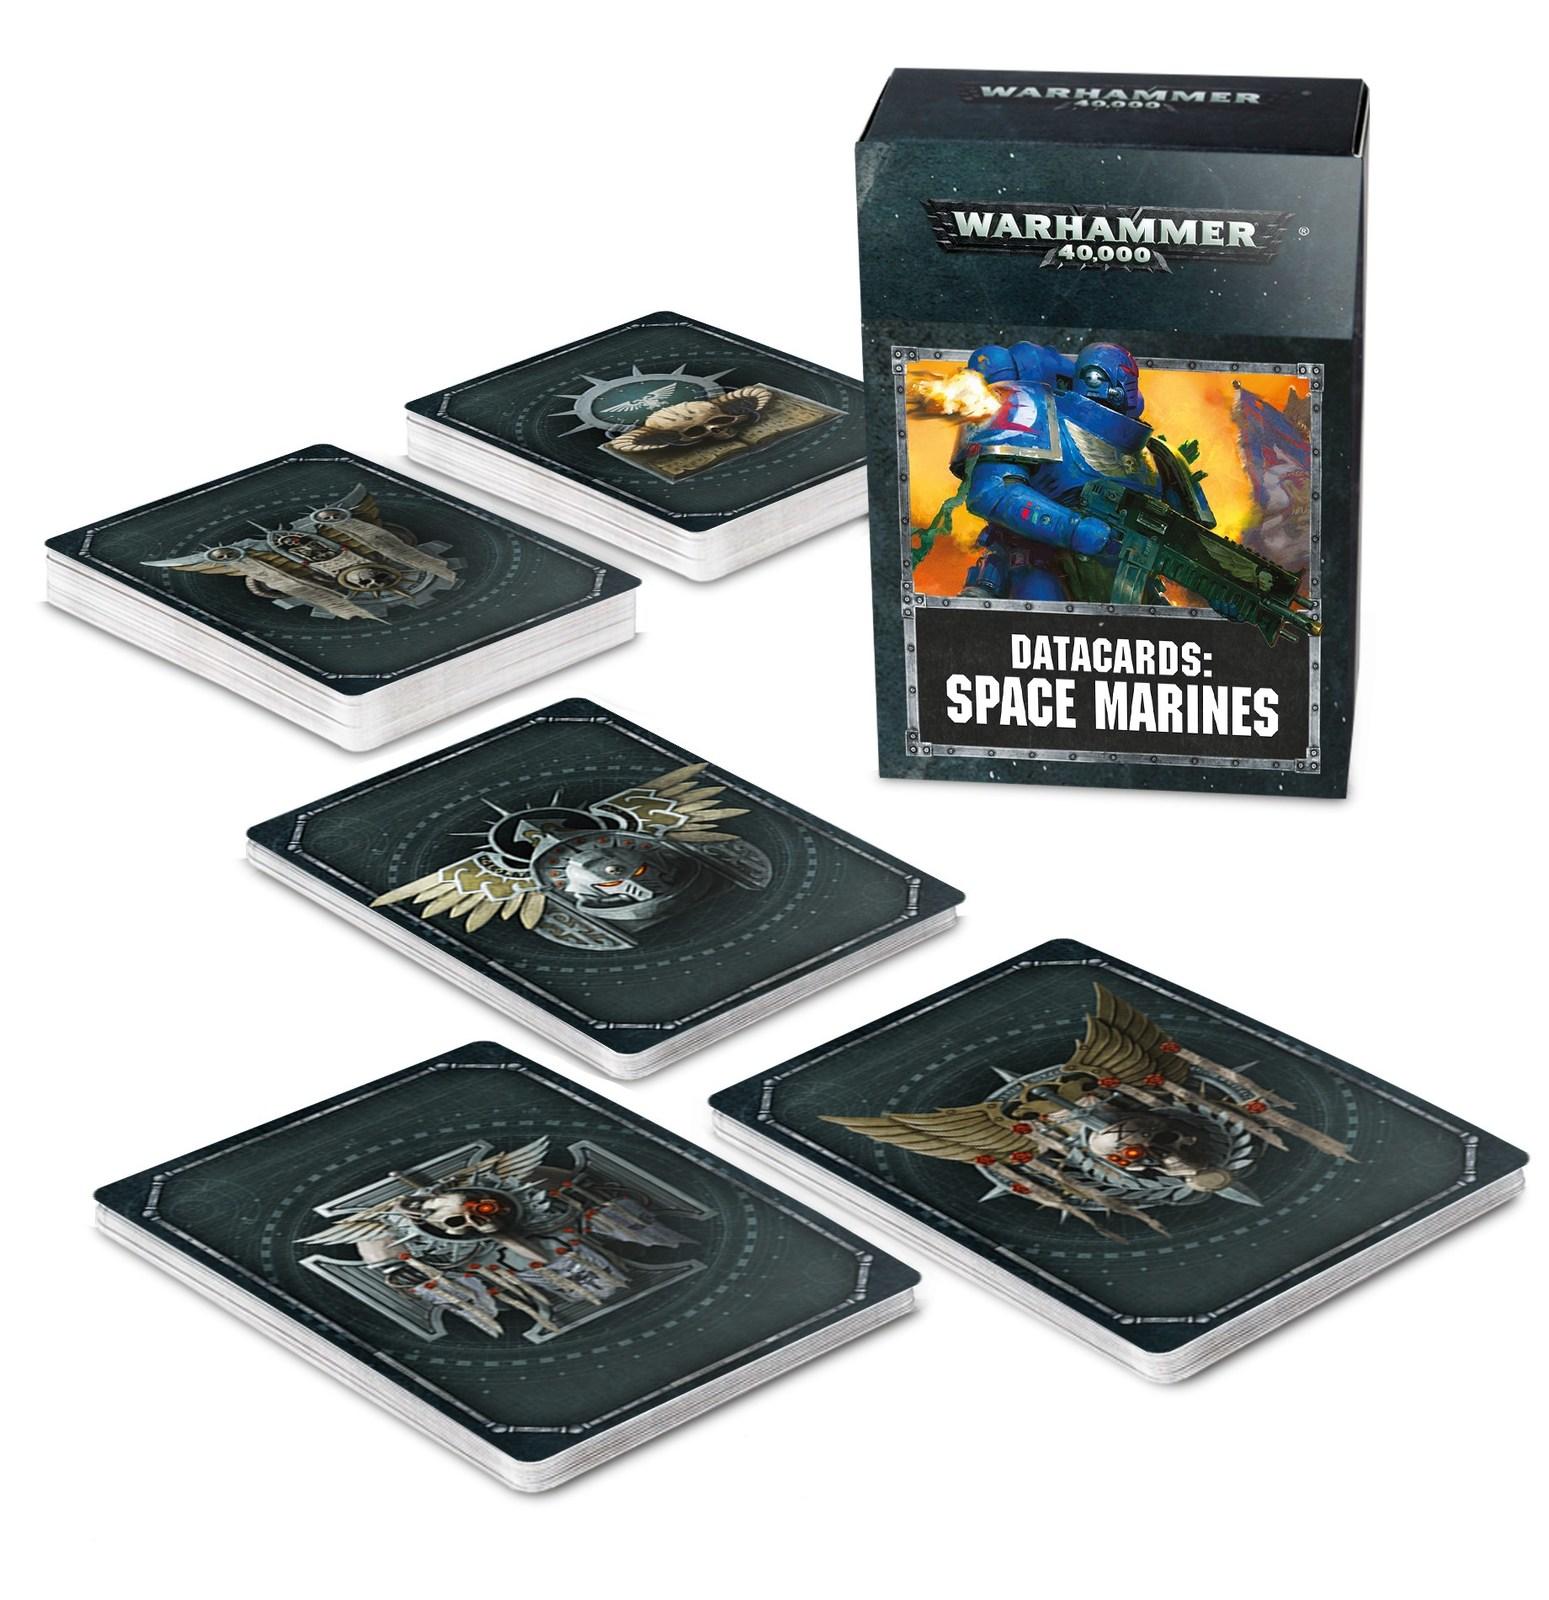 Warhammer 40,000 Datacards: Space Marines image